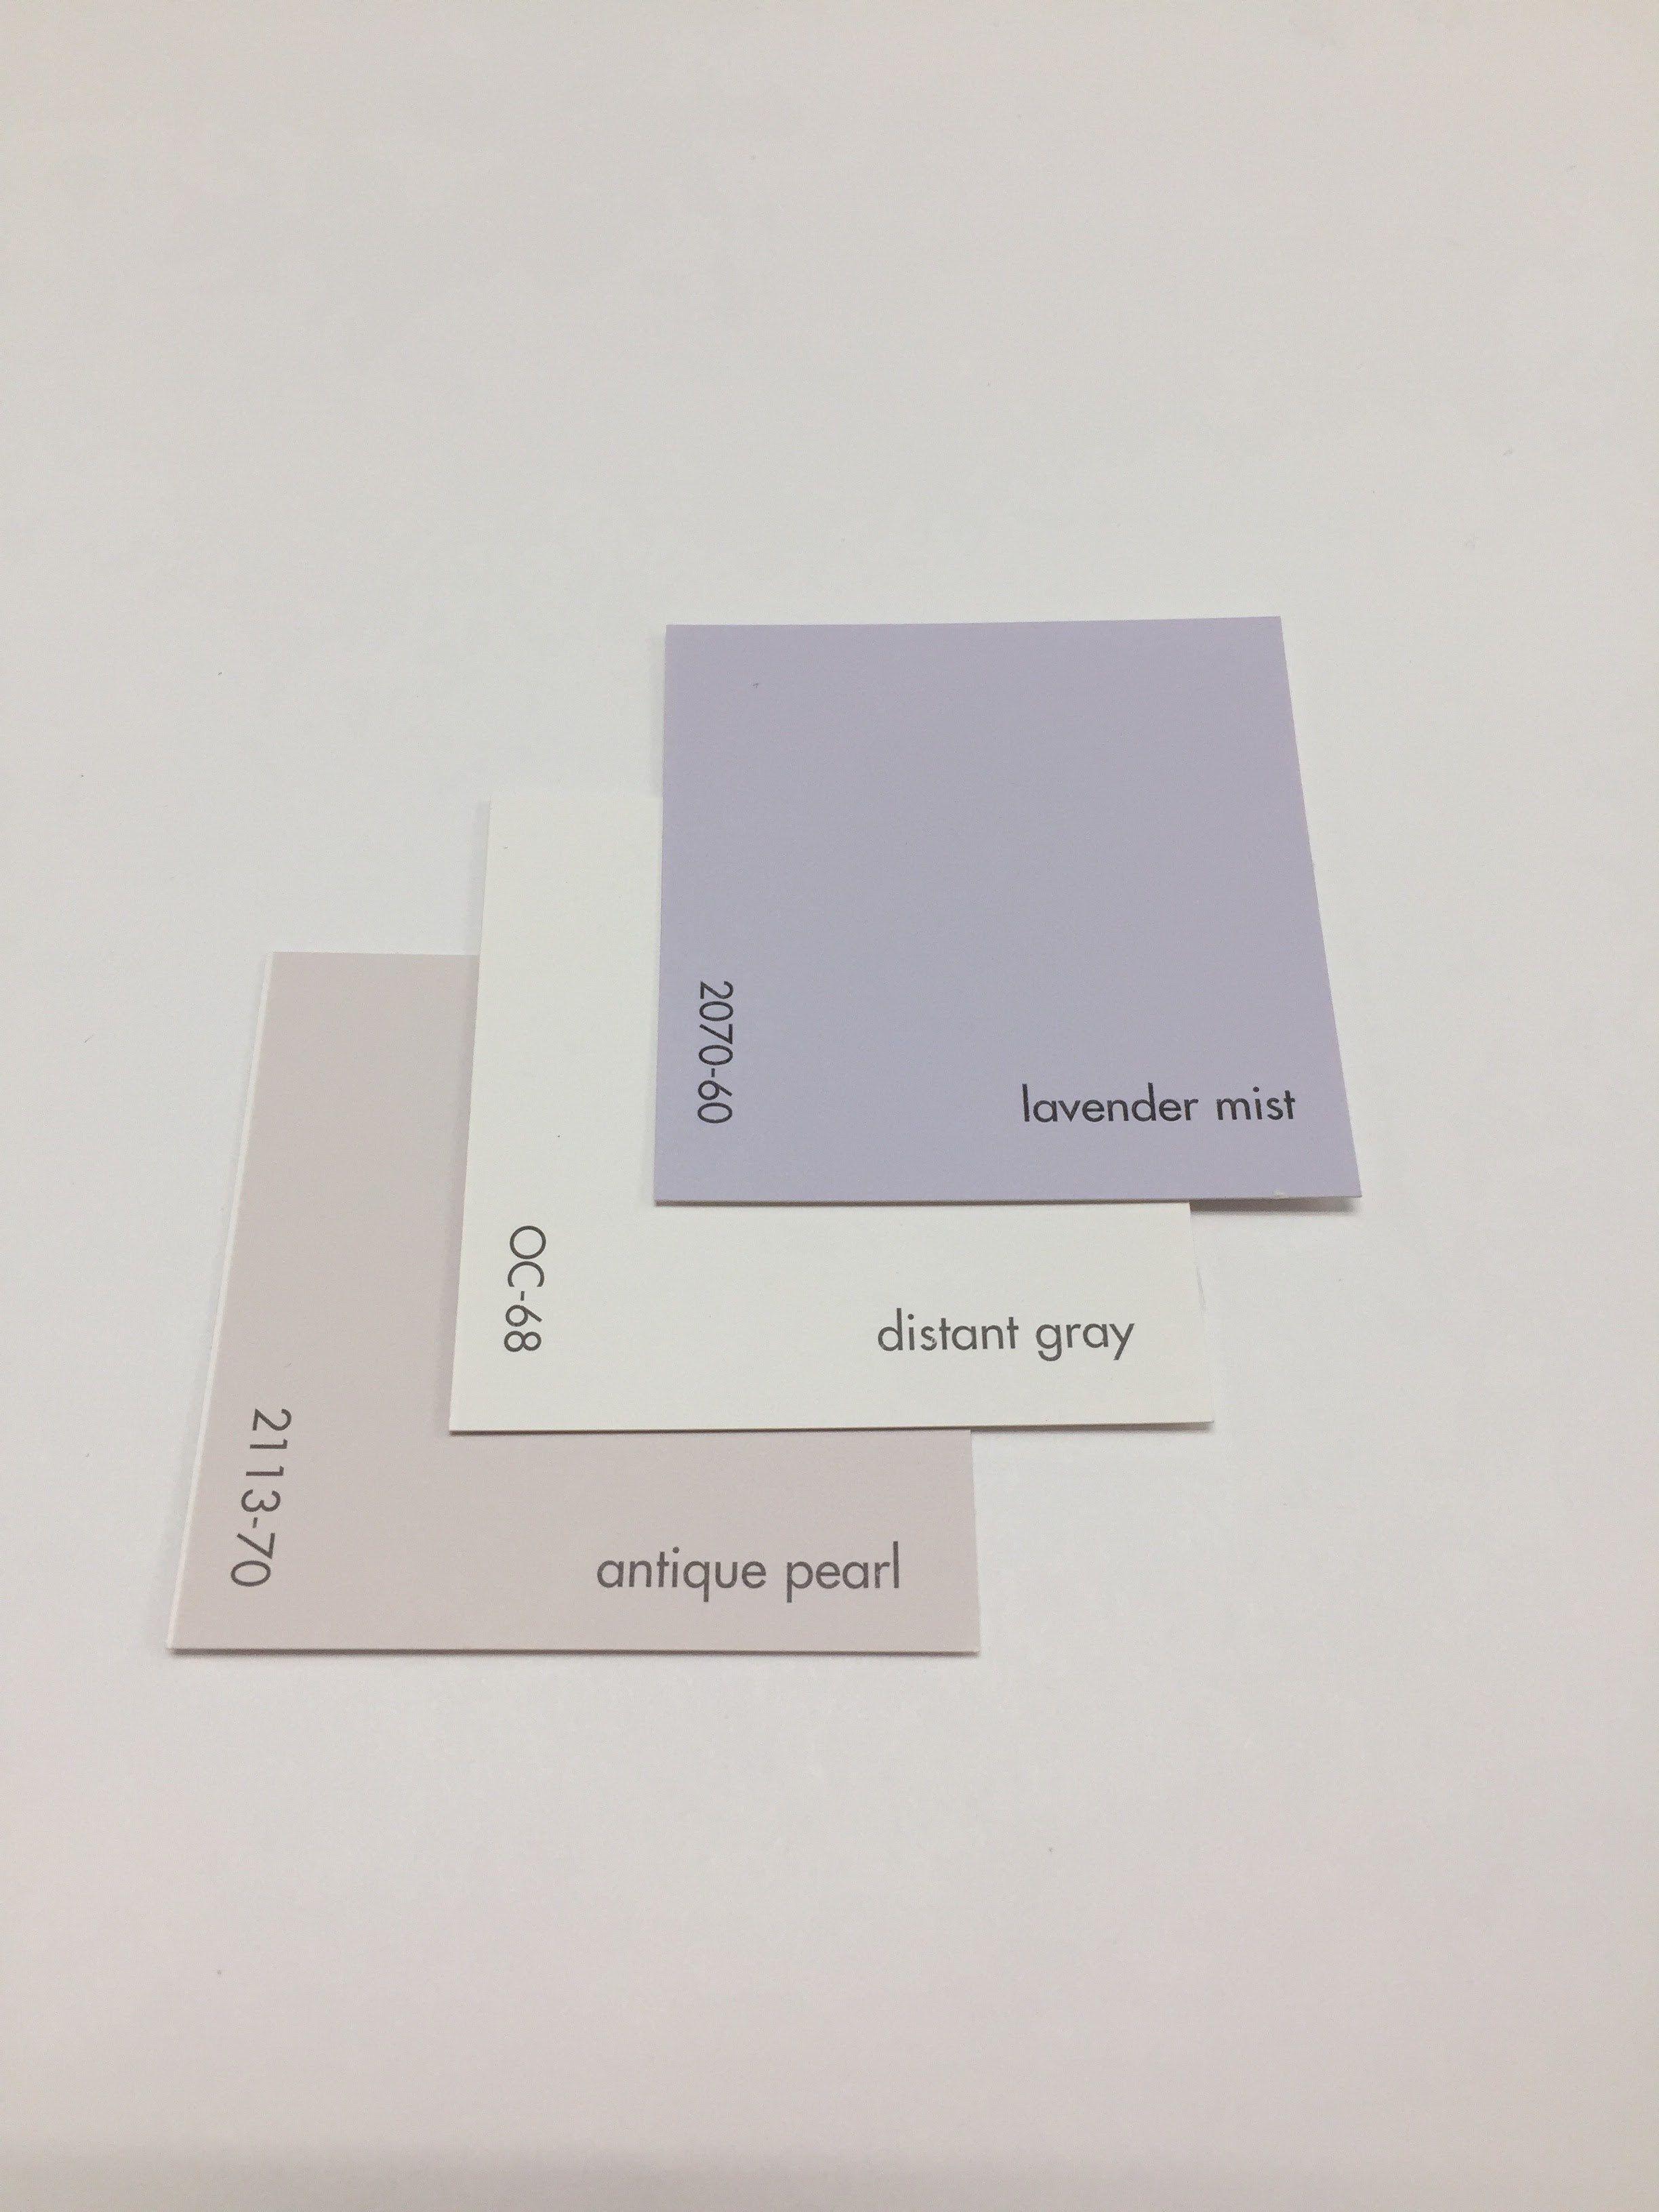 Benjamin Moore Lavender Mist 2070 60 Distant Gray Oc 68